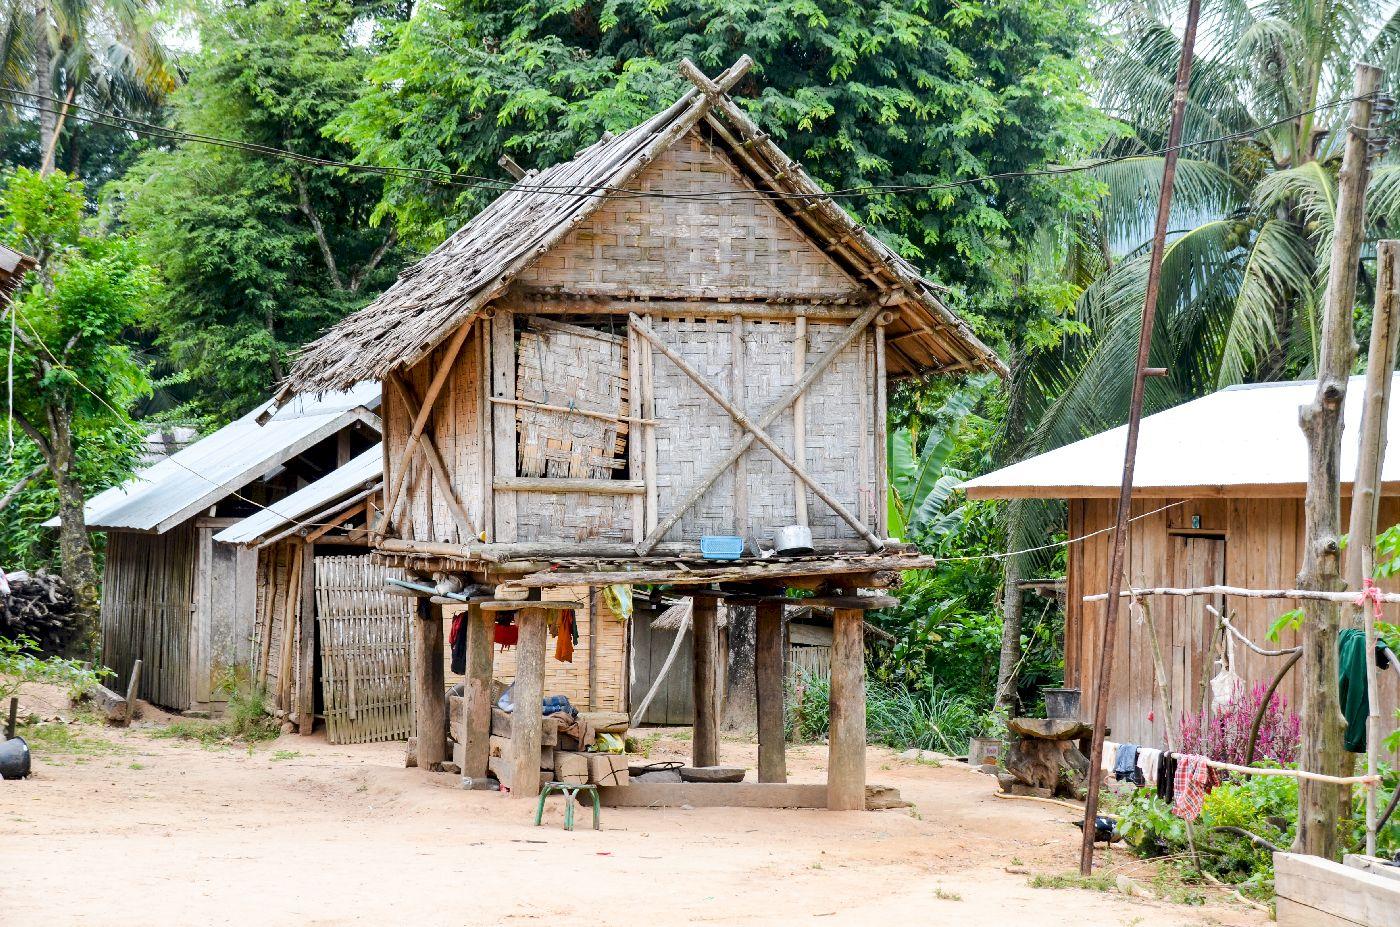 https://blogvoyages.fr/wp-content/uploads/2018/01/Mekong-laos-0015.jpg